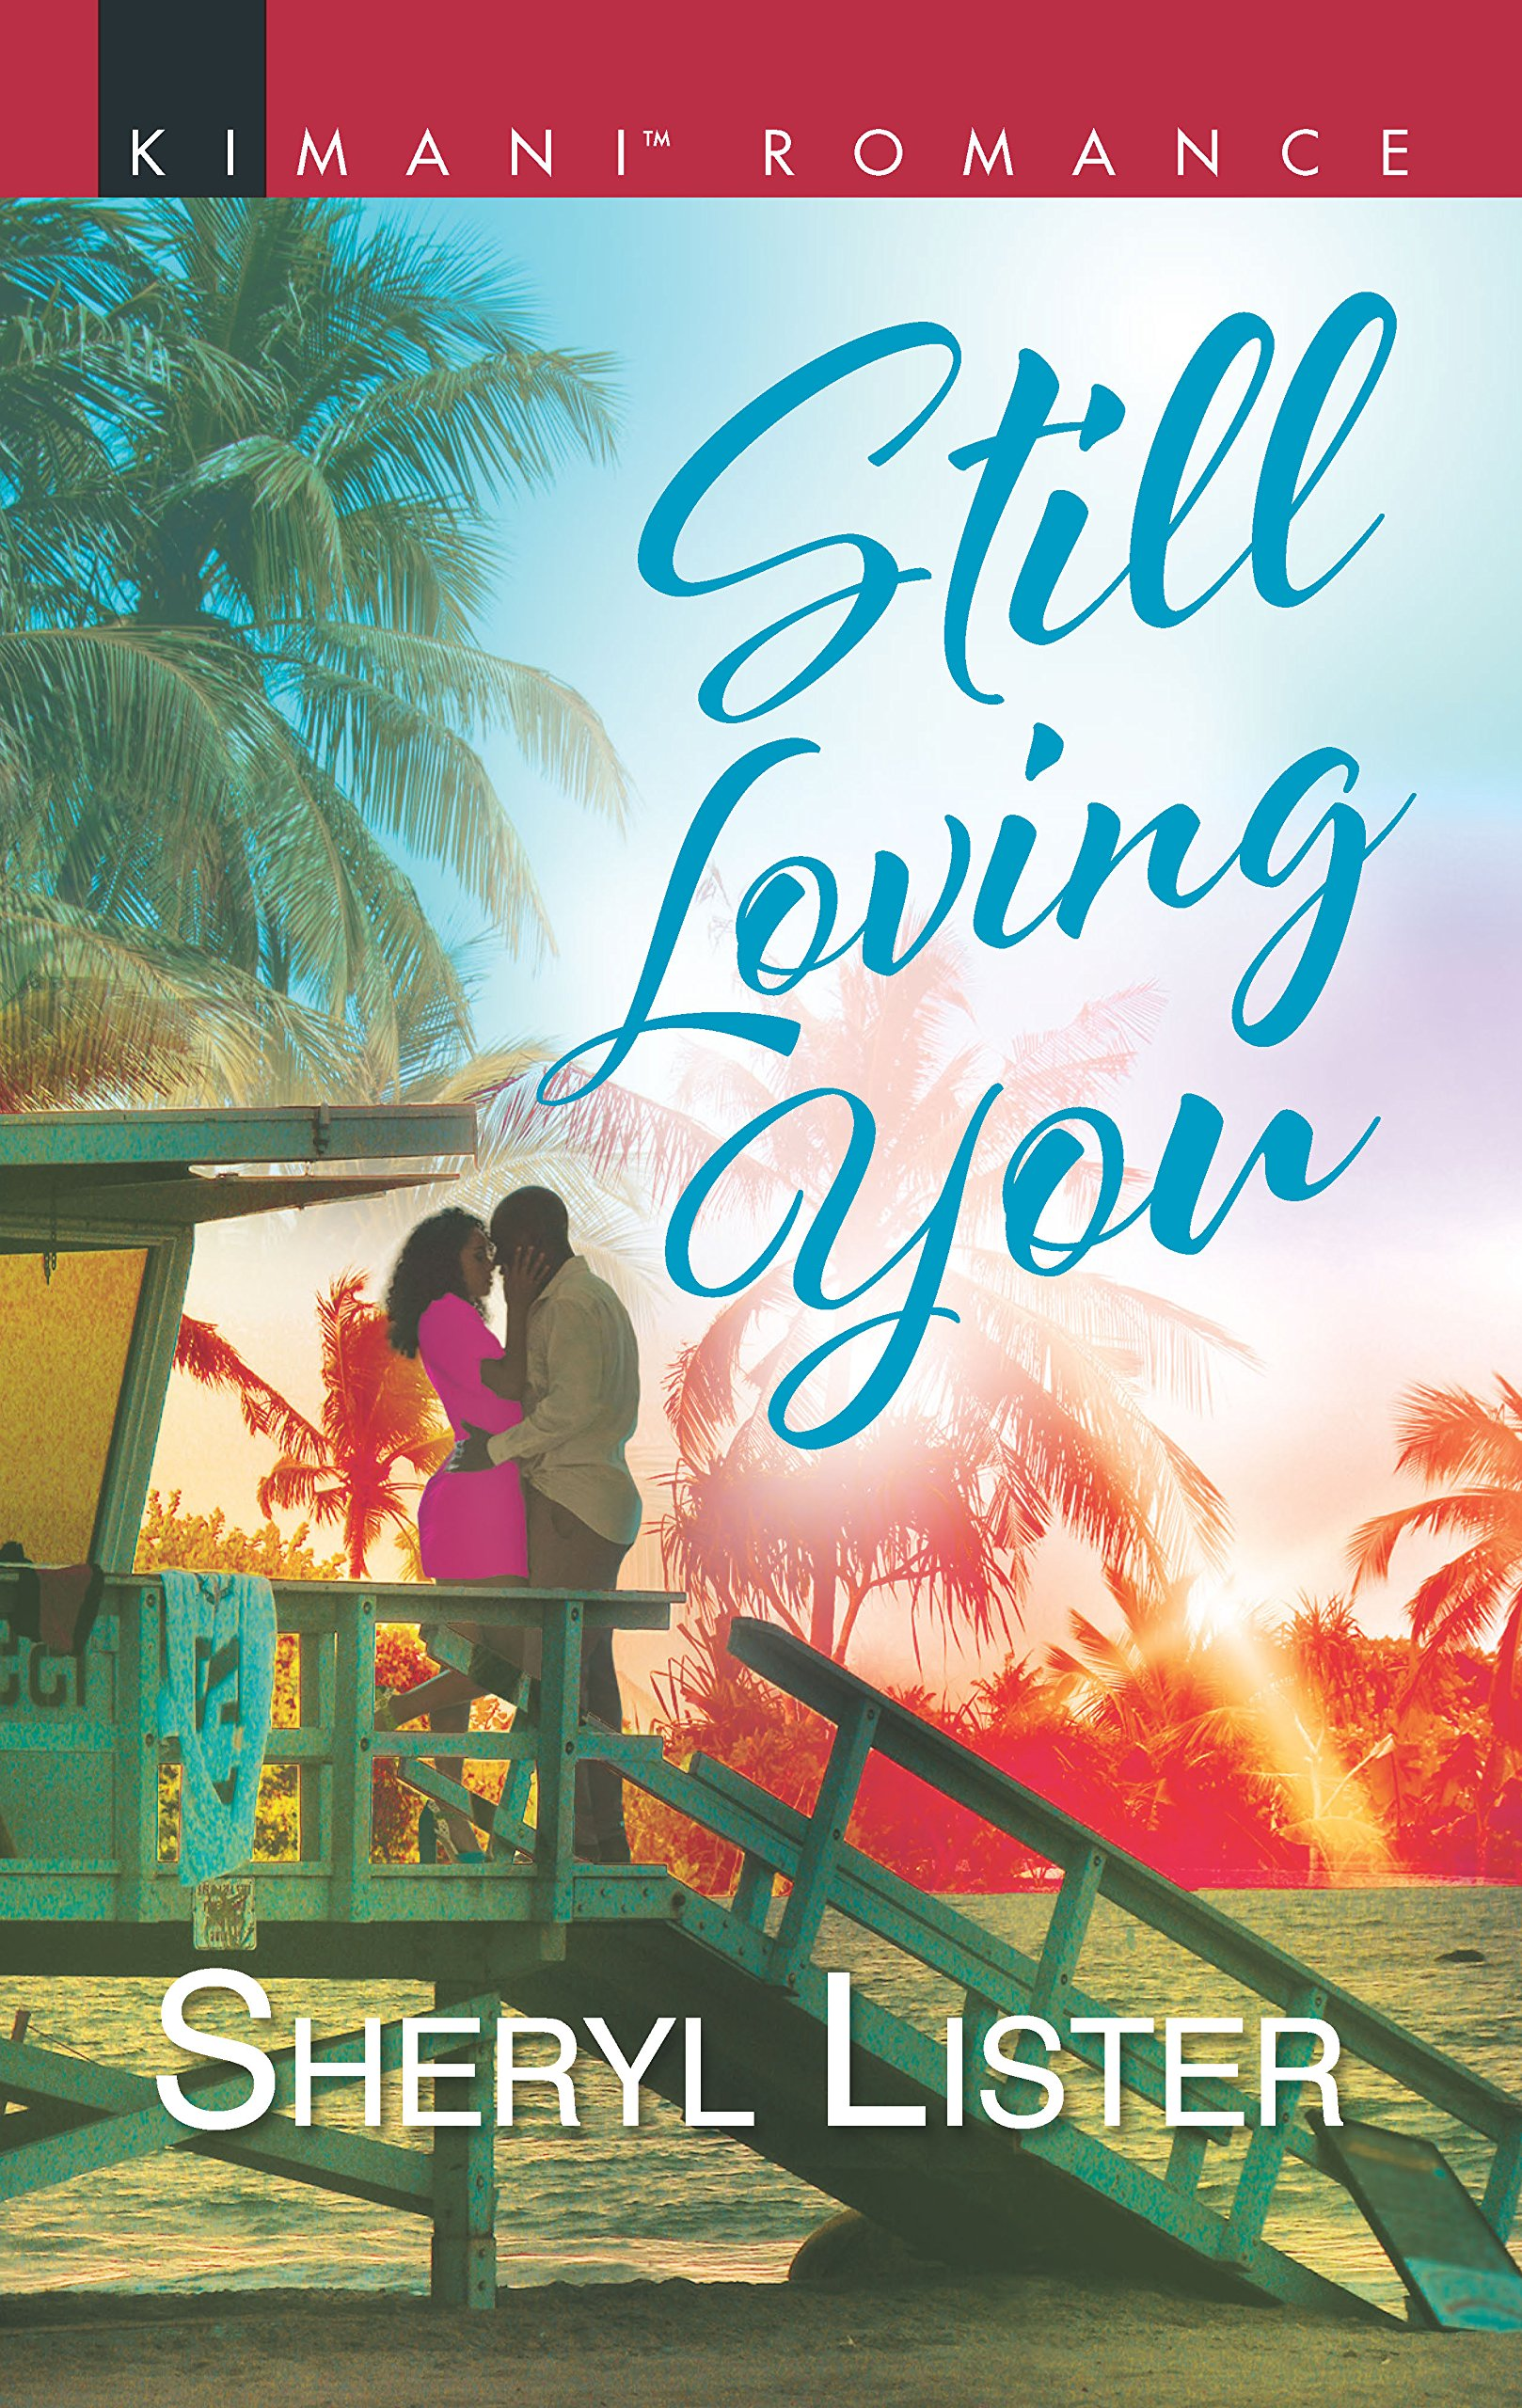 Amazon.com: Still Loving You (The Grays of Los Angeles) (9781335216625):  Sheryl Lister: Books